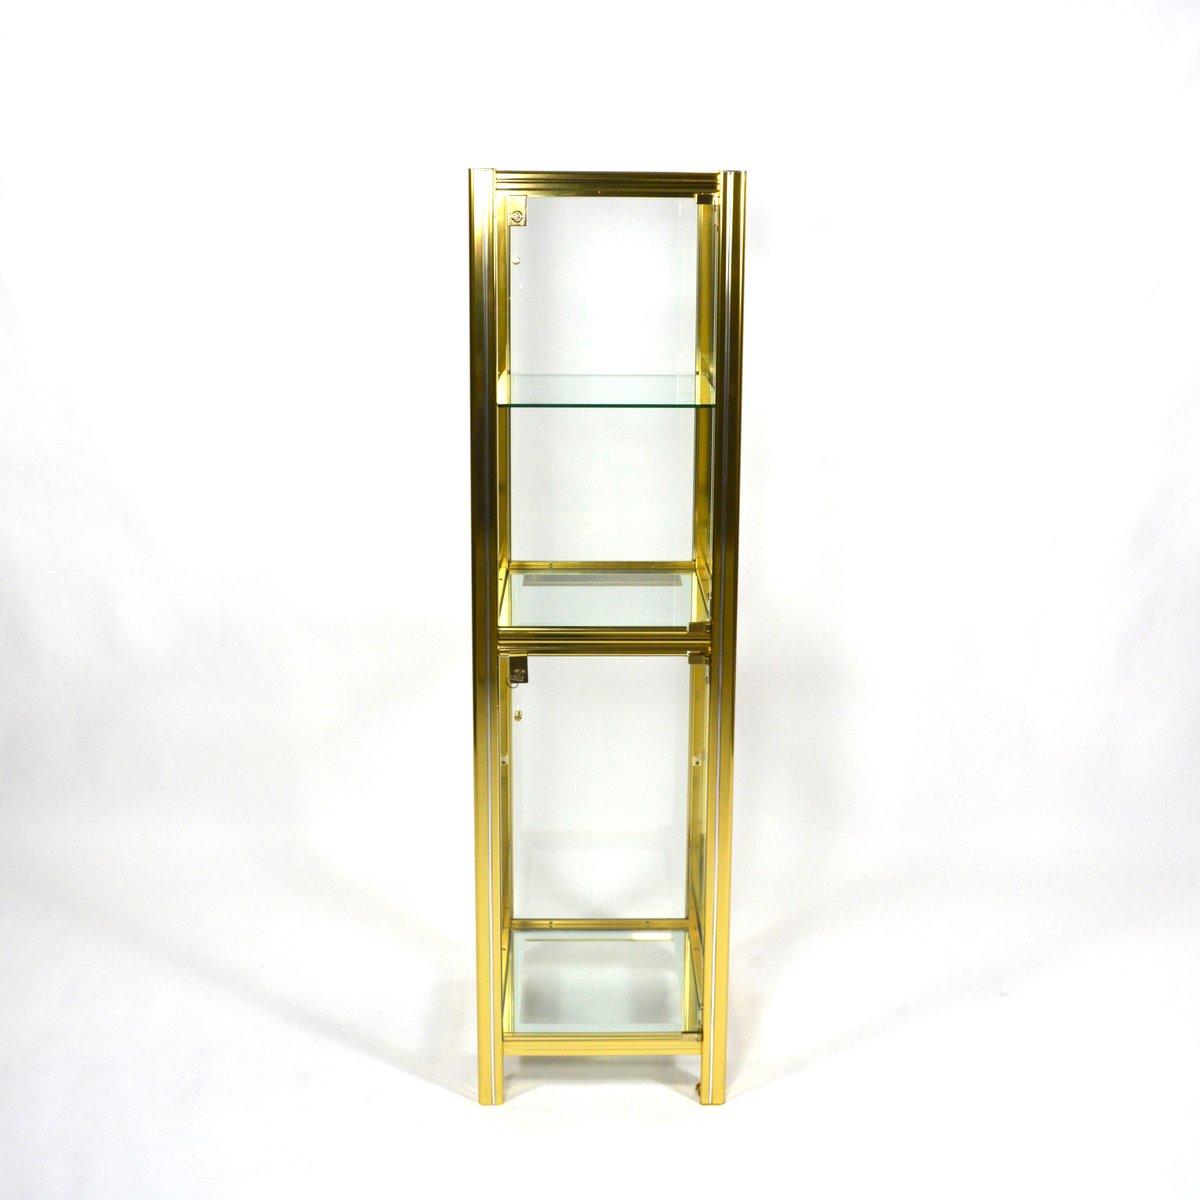 Glazen Kasten Glasvitrine.Glas Vitrine Caso Glass Kabinet Oak Glas With Glas Vitrine Awesome